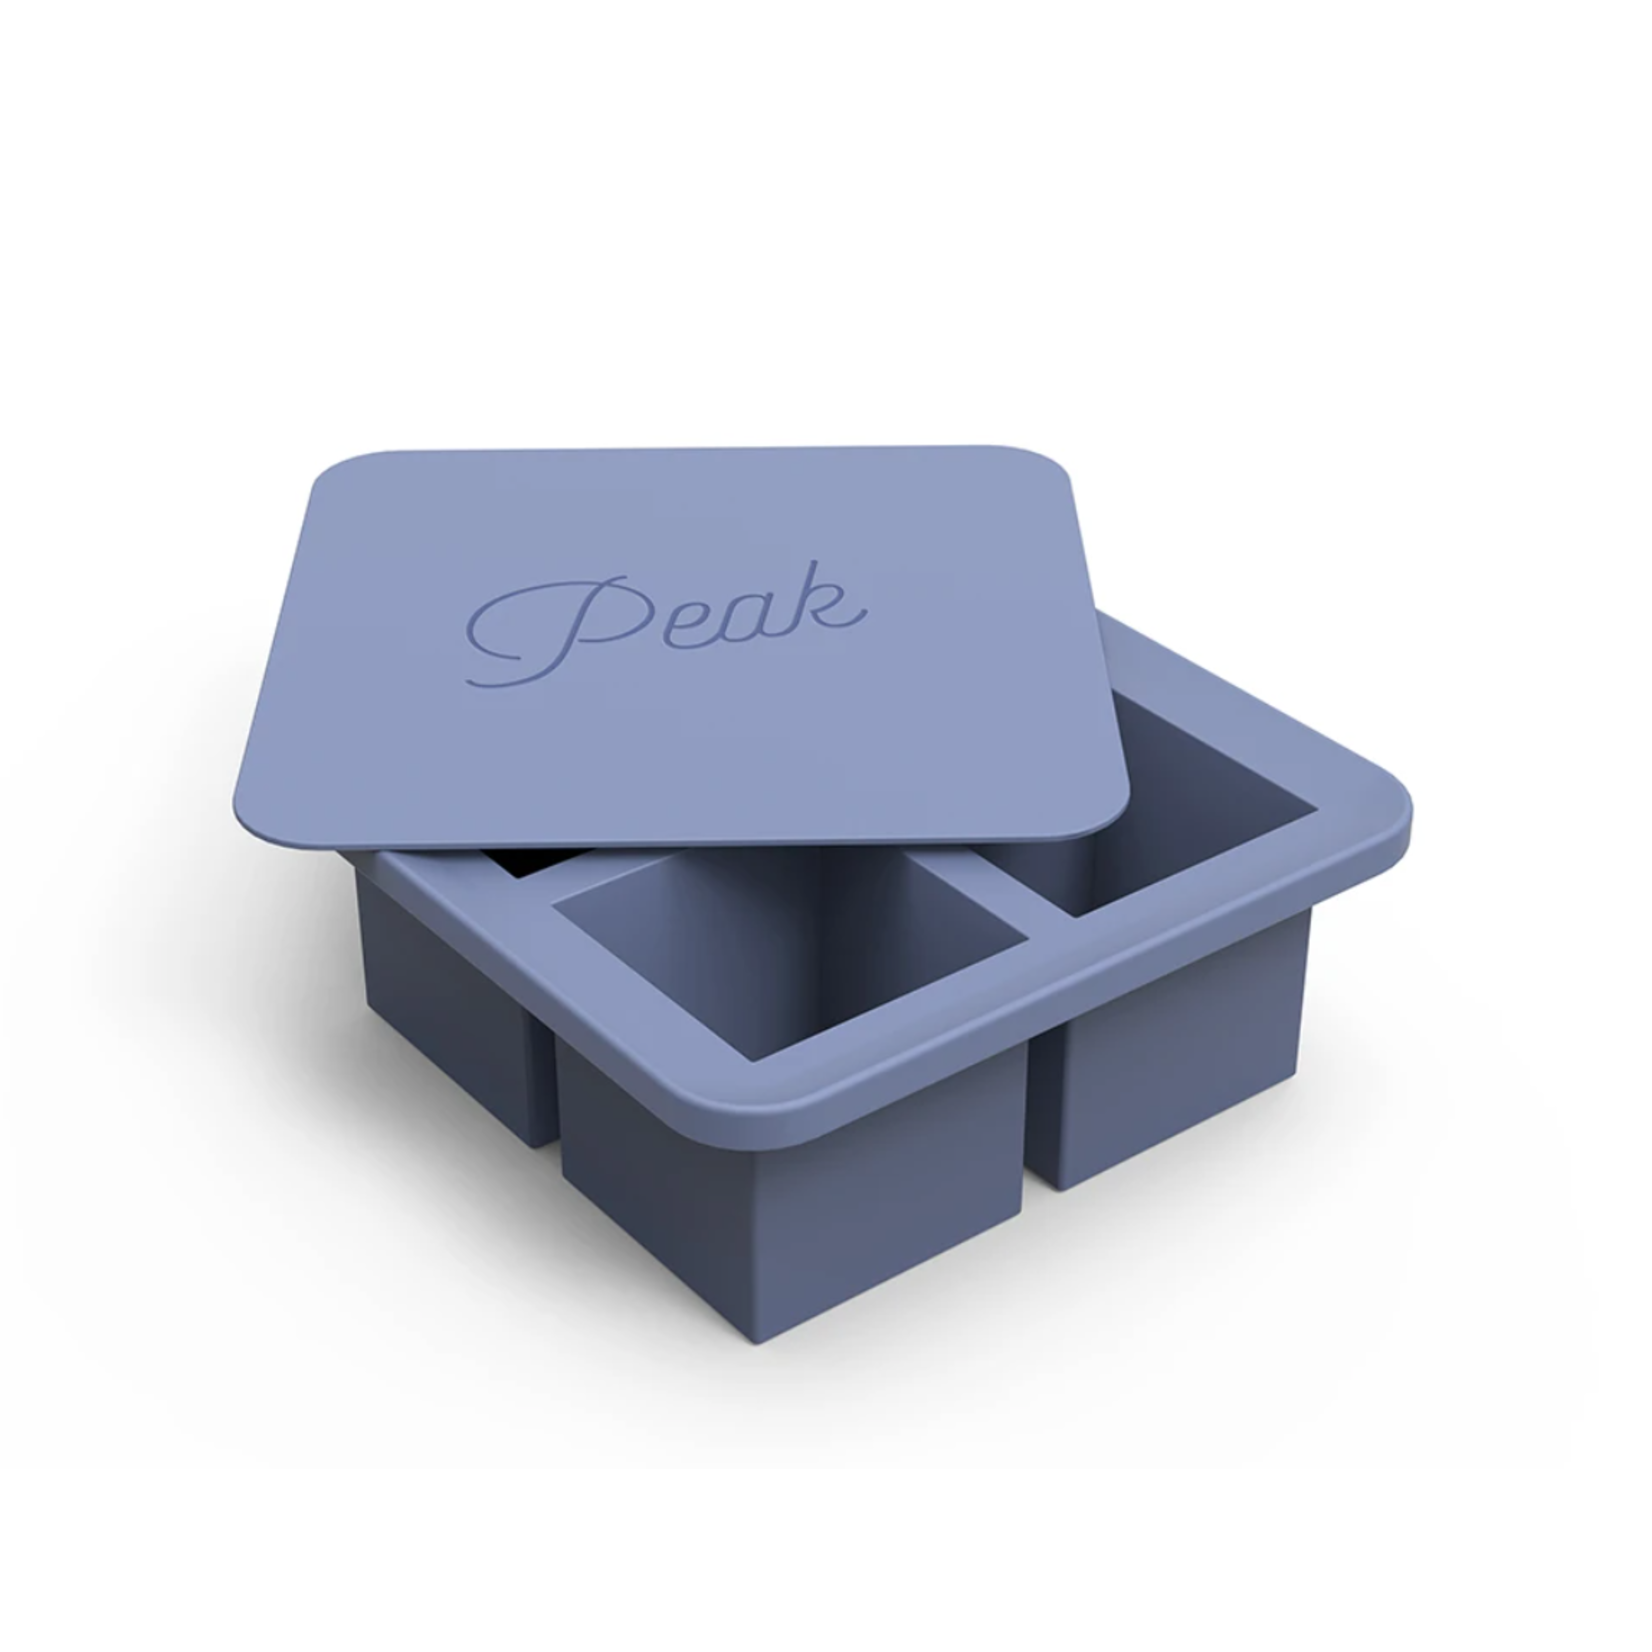 W & P Designs Peak XL Ice Cube Tray in Blue